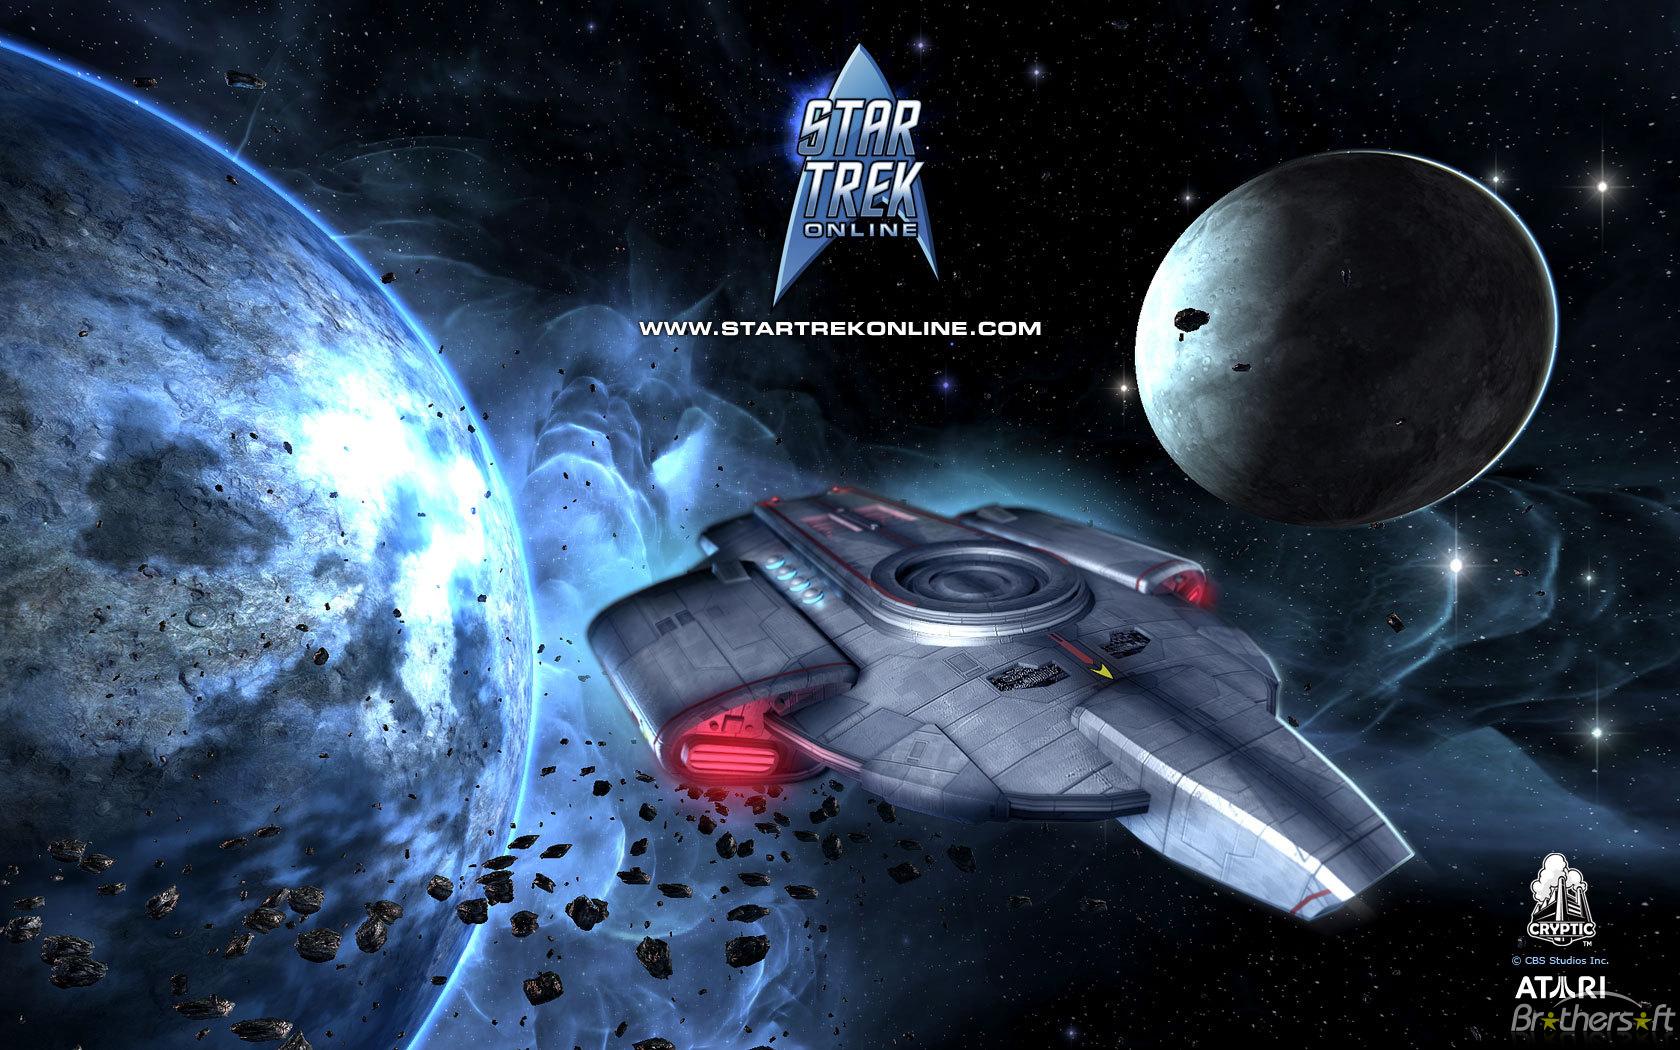 Star trek online wallpaper free